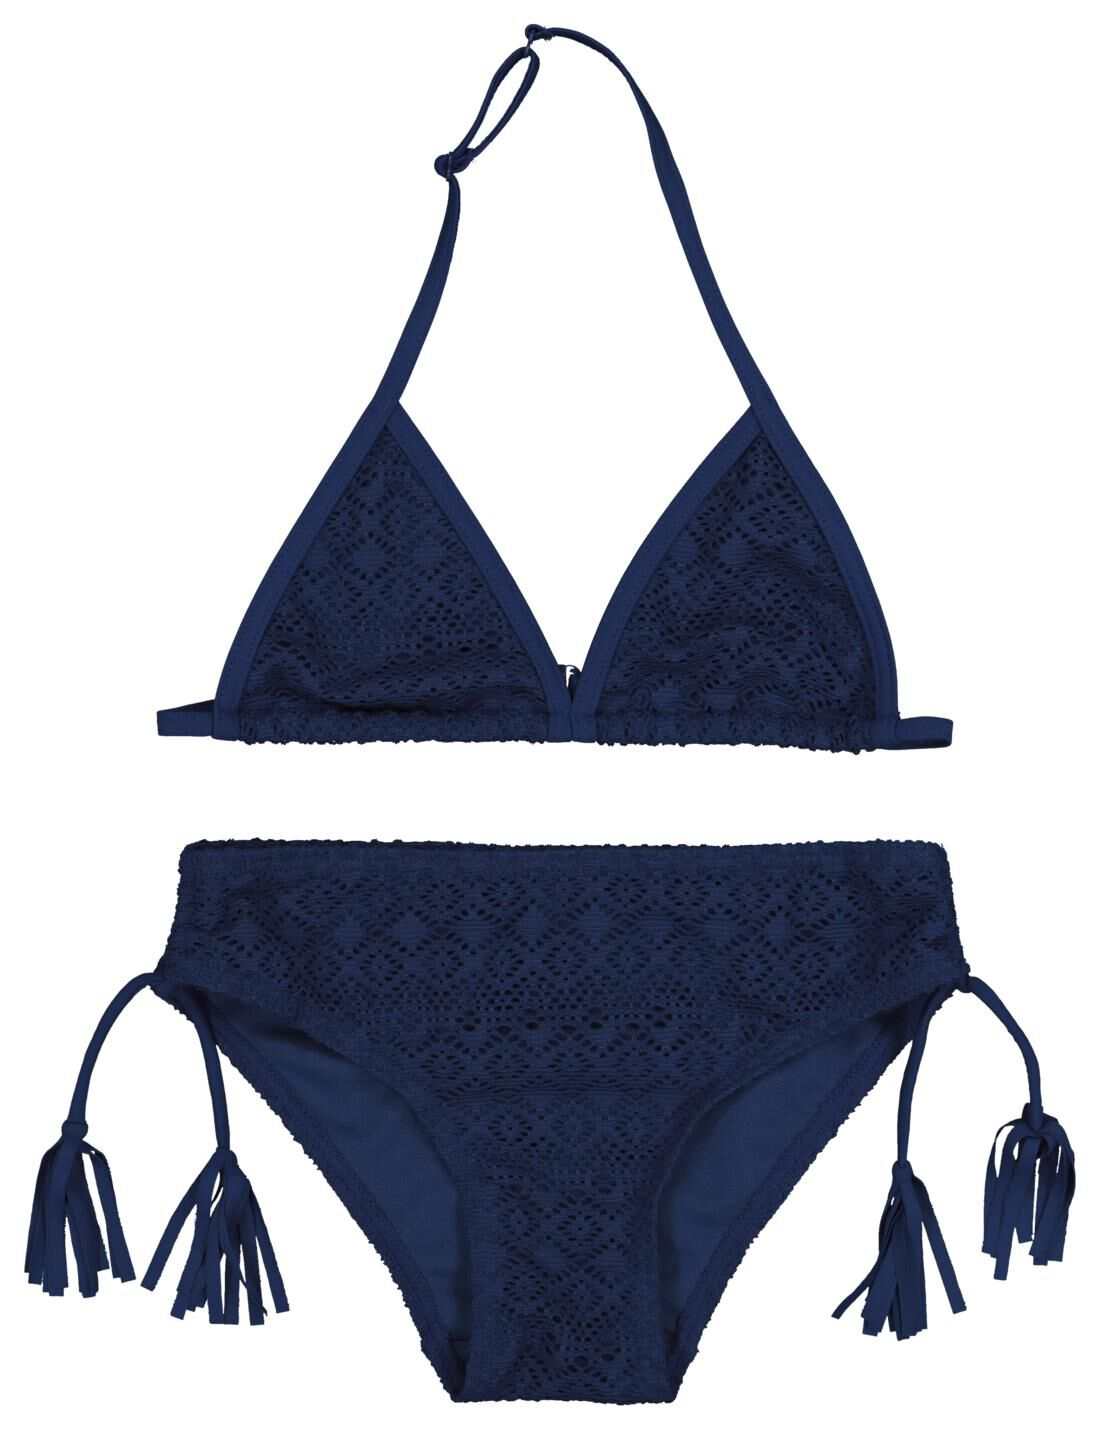 HEMA Kinderbikini Triangel Donkerblauw (donkerblauw)